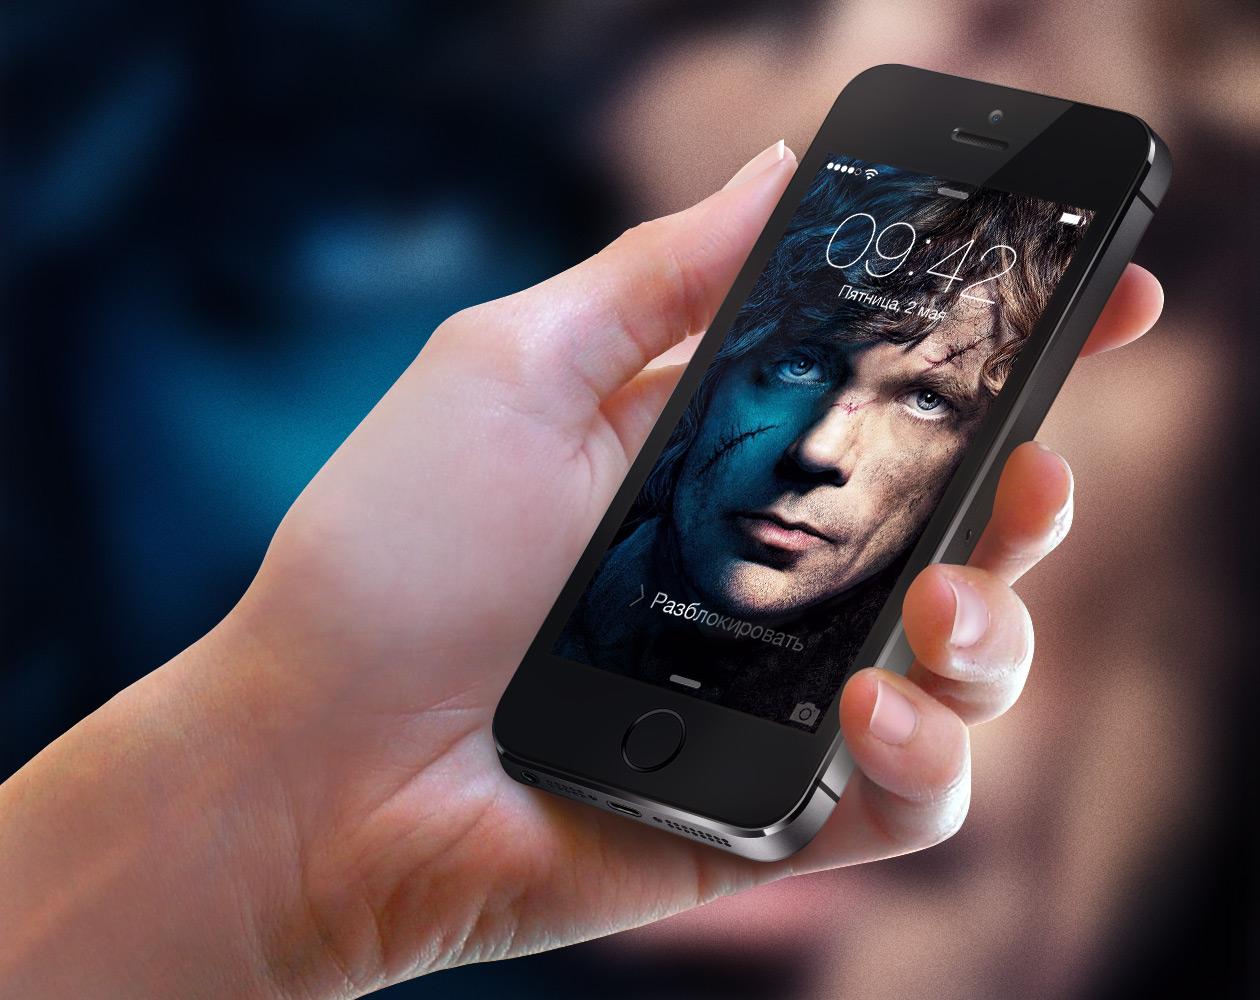 Обои для iPhone 5/5s: «Игра престолов»